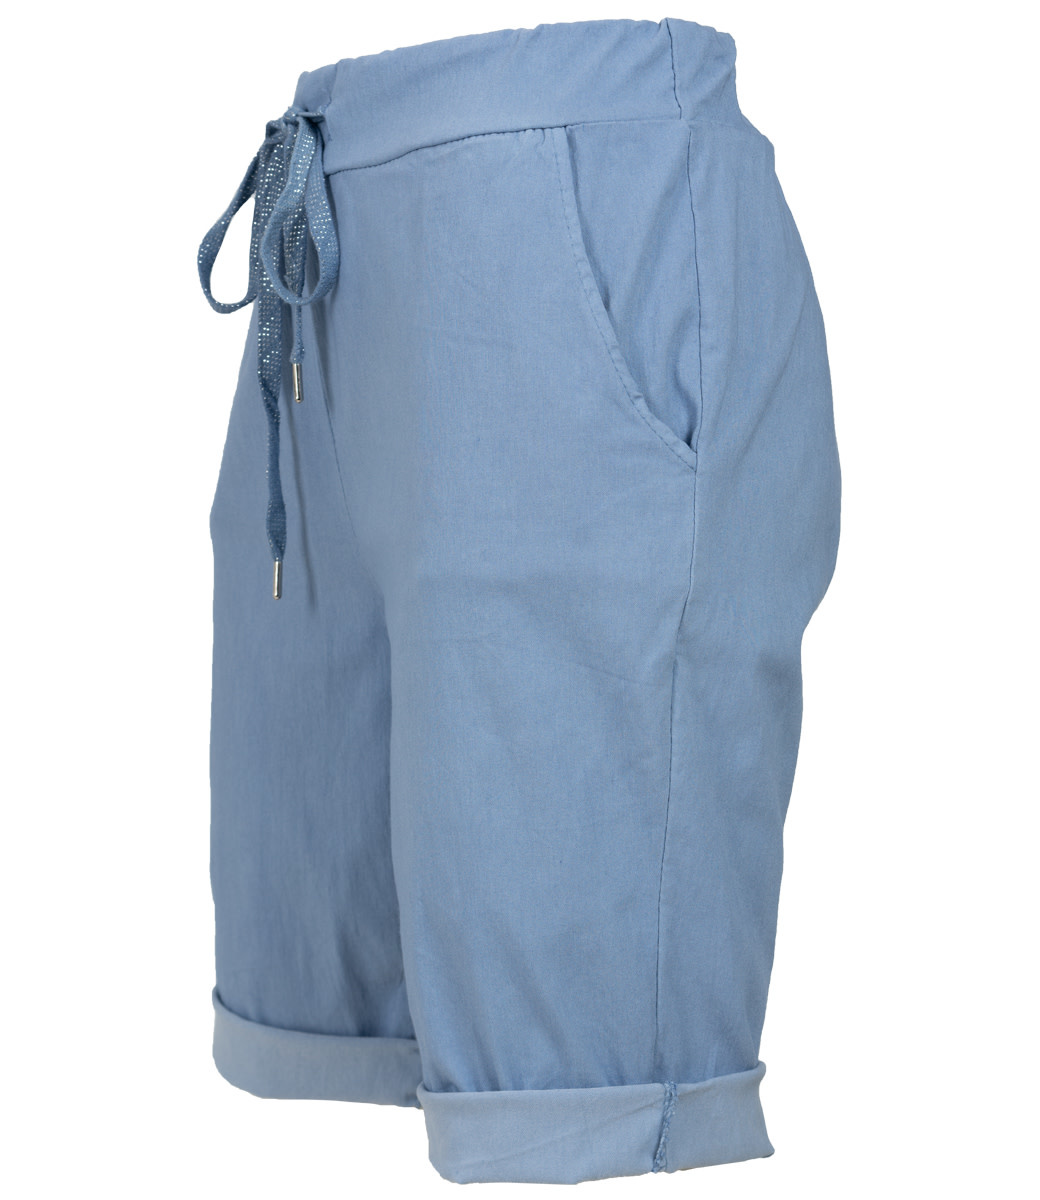 Wannahavesfashion Korte broek jeansblauw Cor